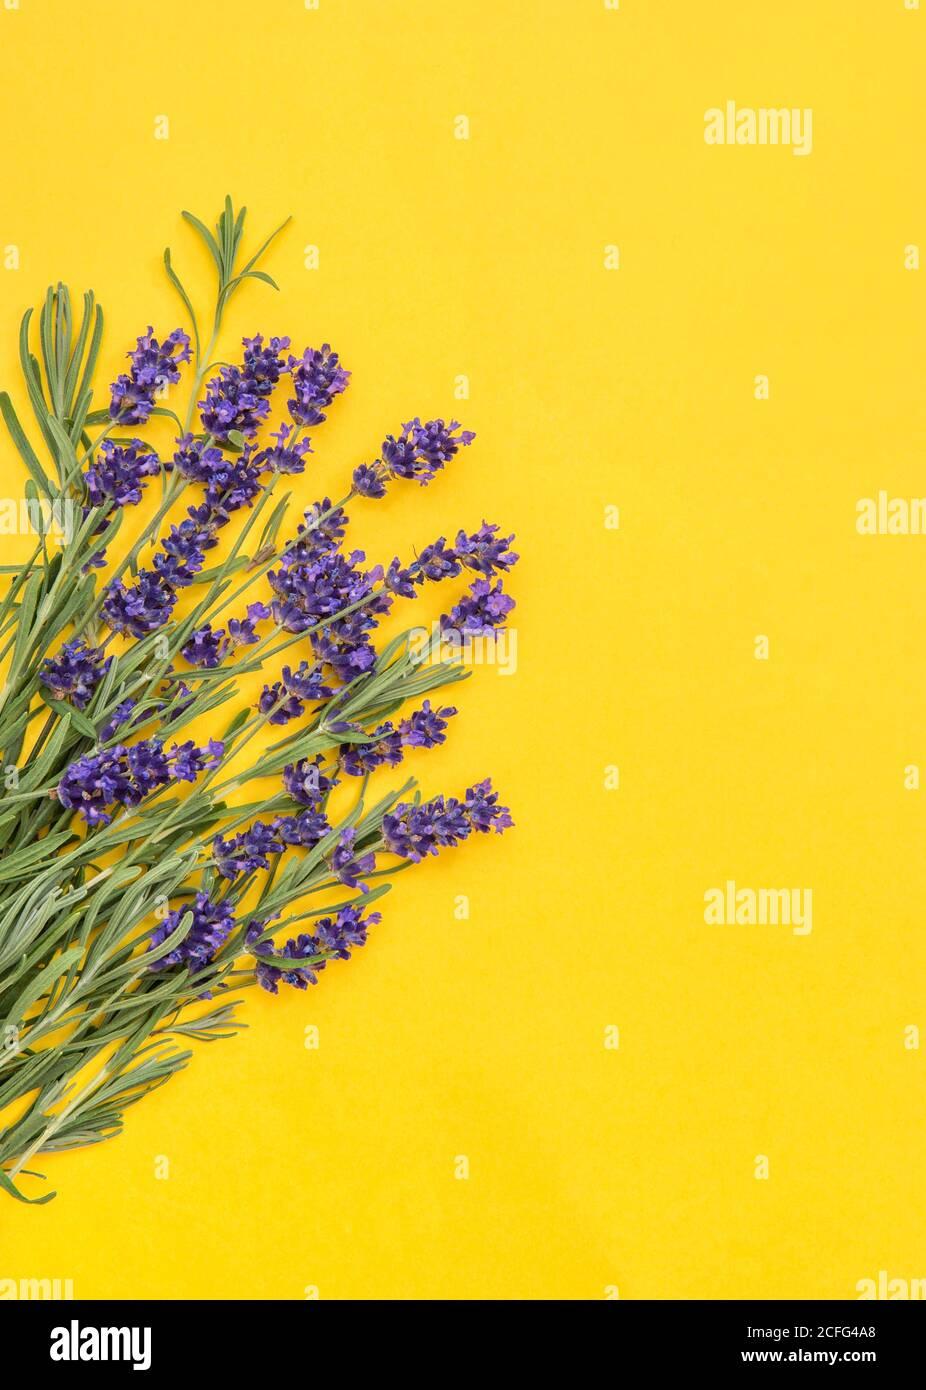 Flores de lavanda sobre fondo amarillo. Borde botánico floral Foto de stock